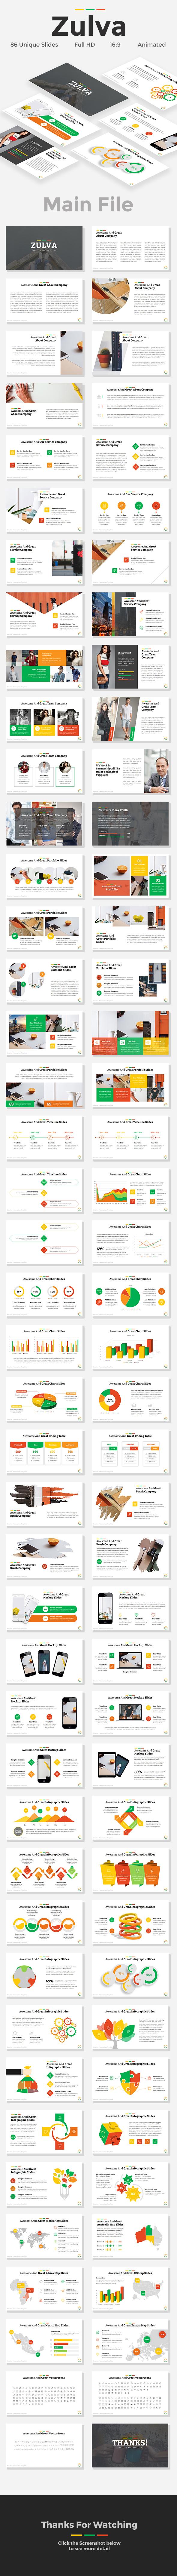 Zulva - Creative Google Slides Template - Google Slides Presentation Templates